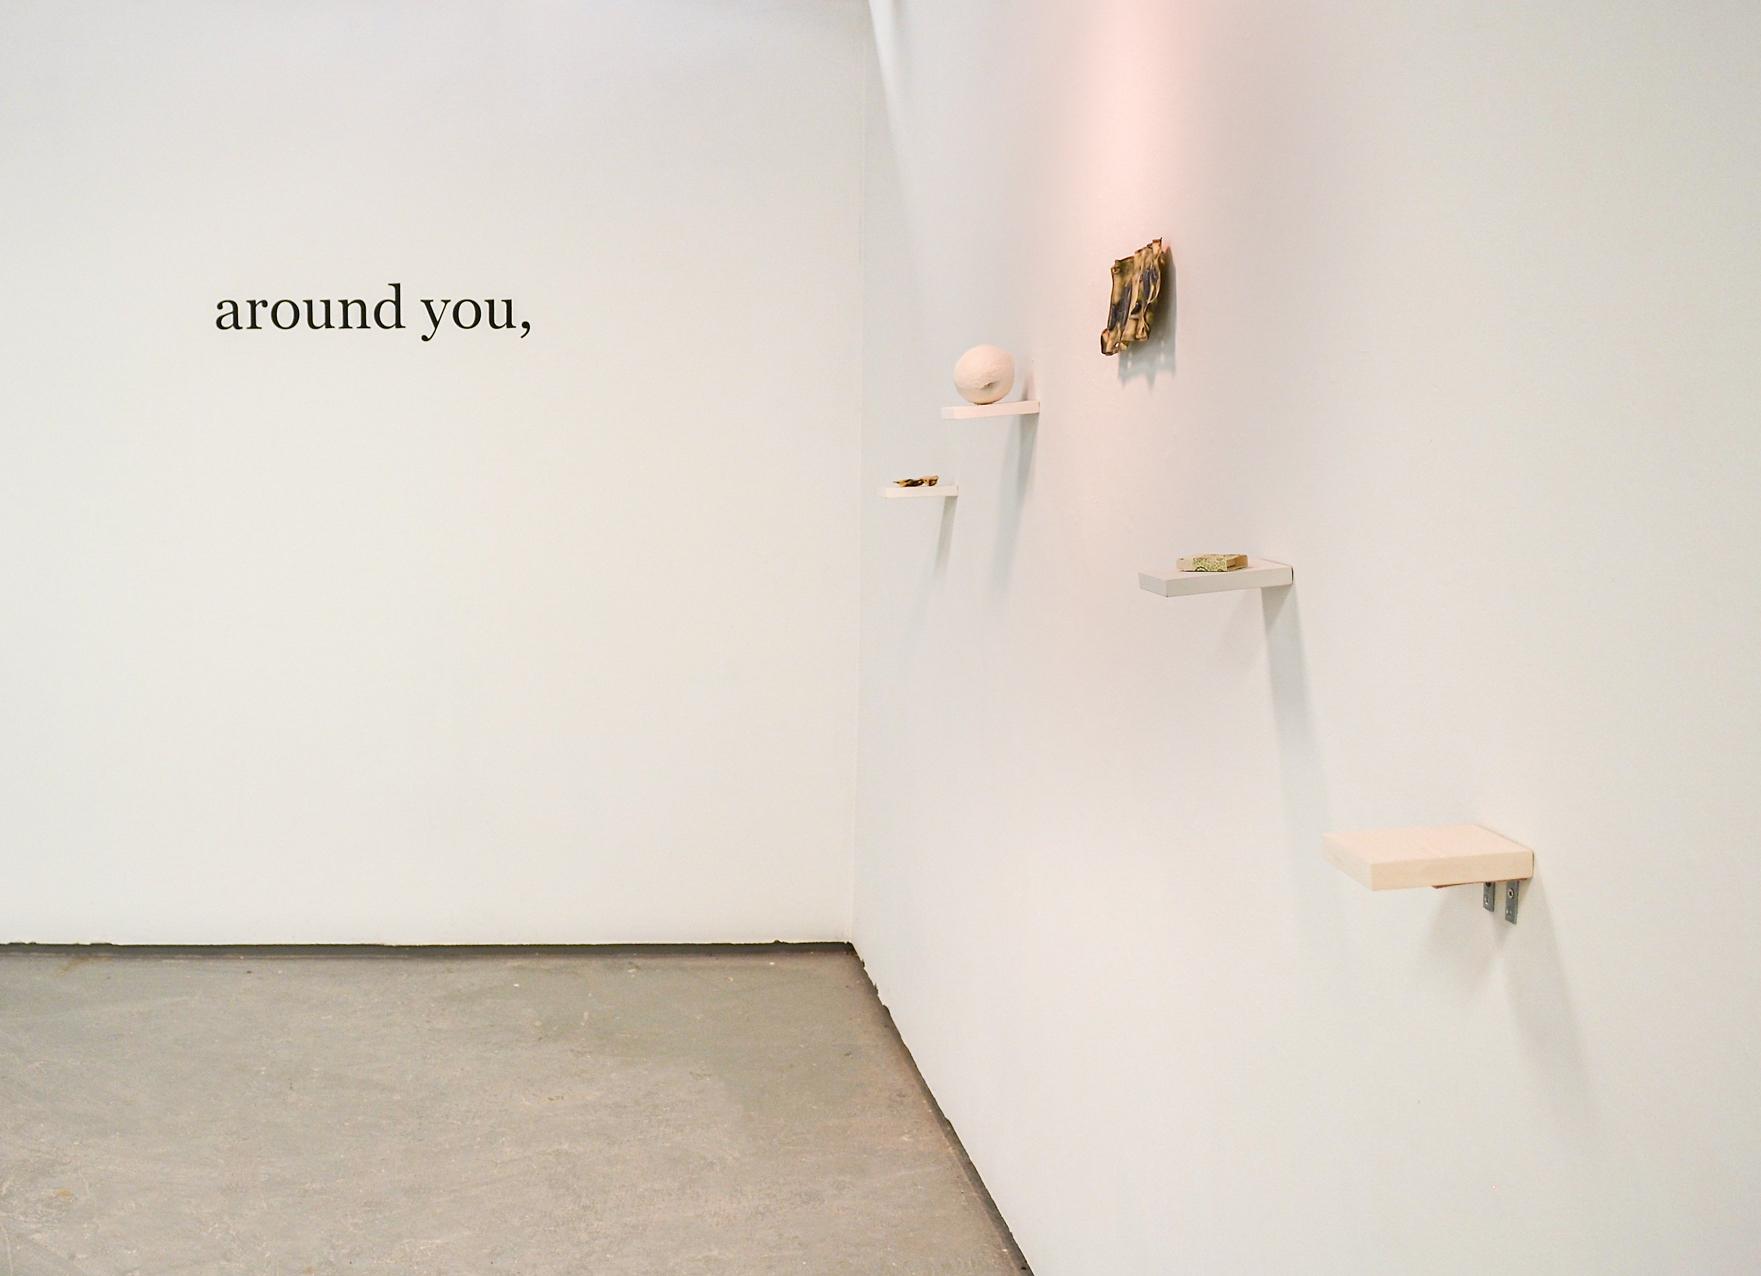 around you.JPG